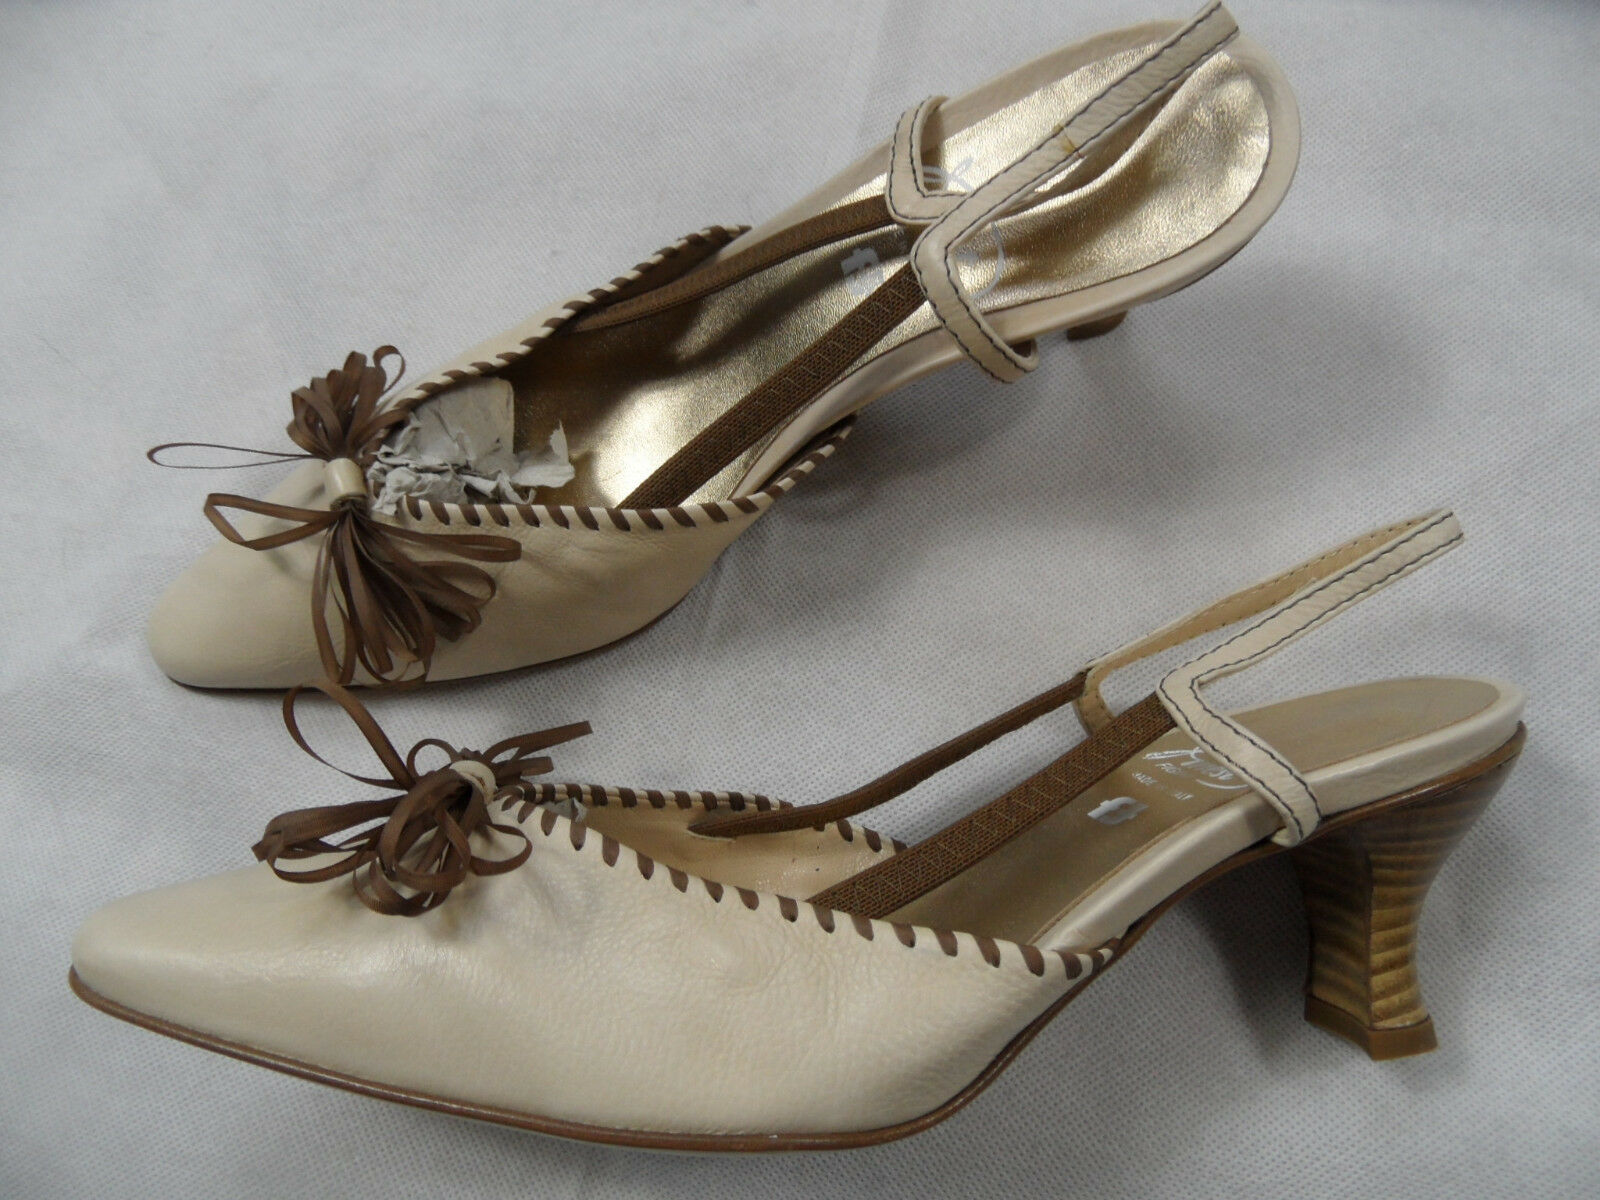 Finest Figini Varese belle Slingpumps boucle beige clair Taille 39 1 2 neuf kas918